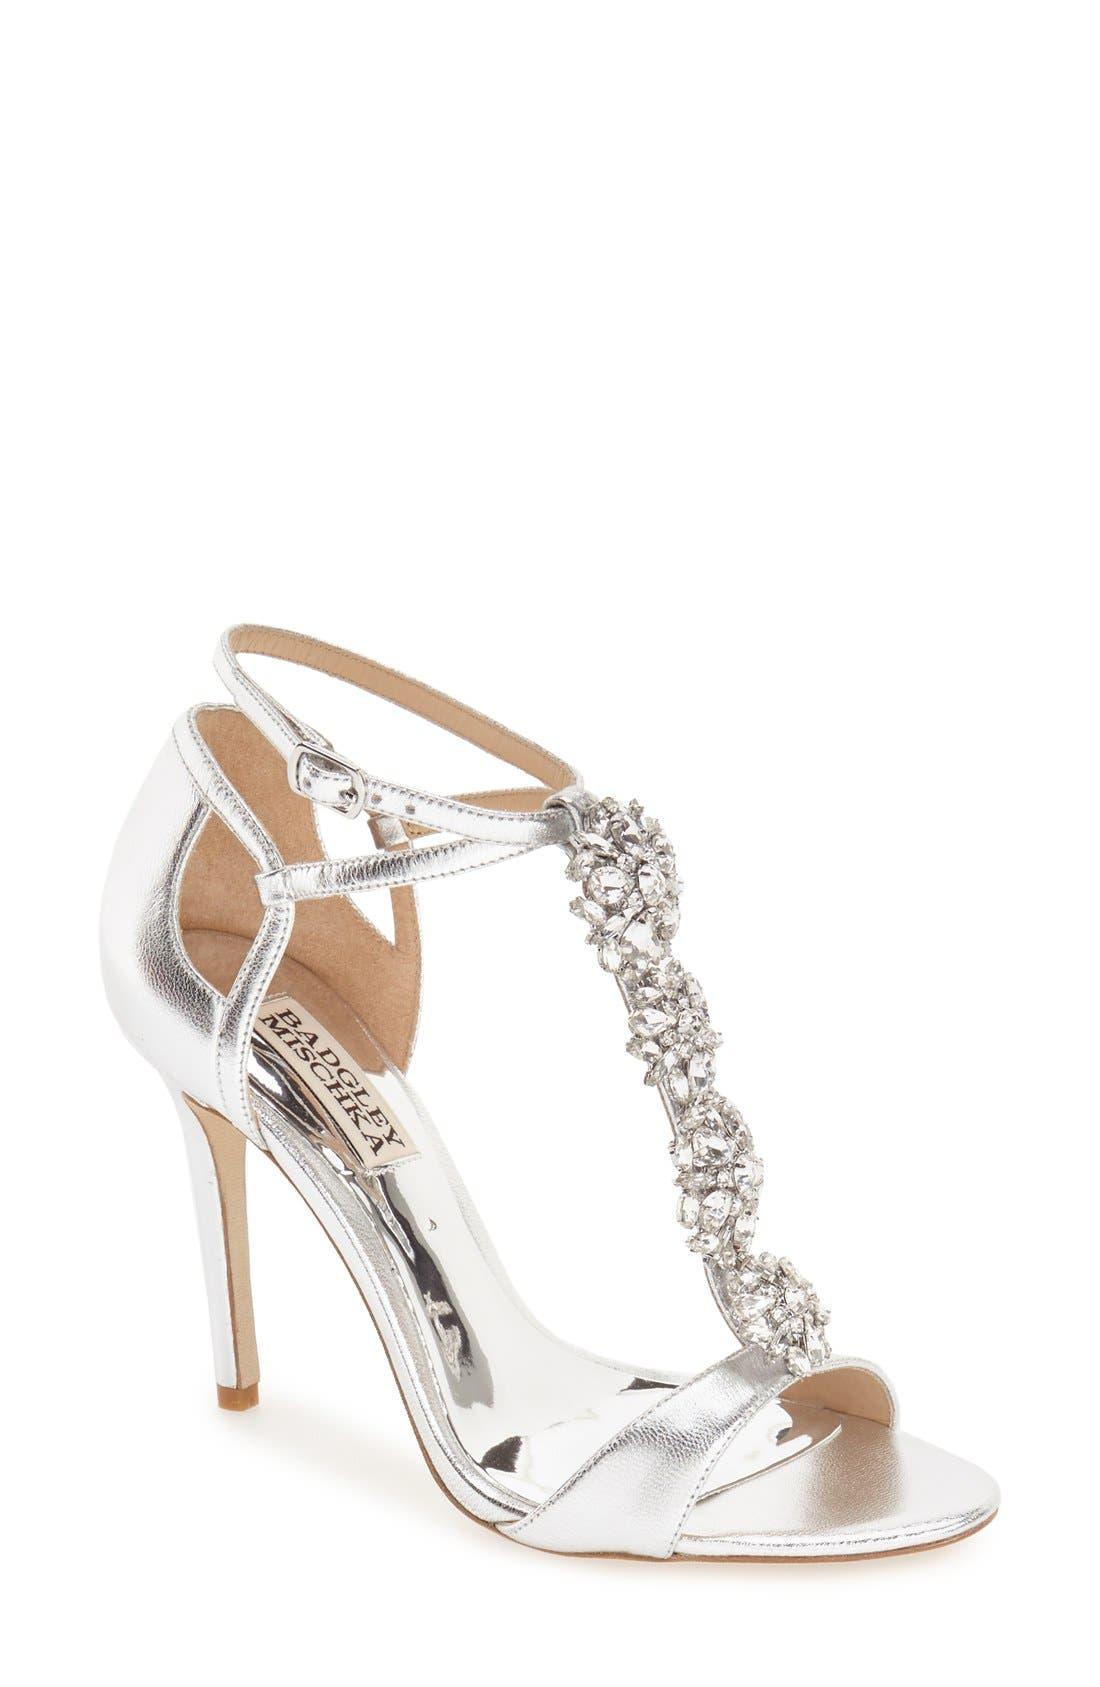 Main Image - Badgley Mischka 'Leigh' Embellished Evening Sandal (Women)